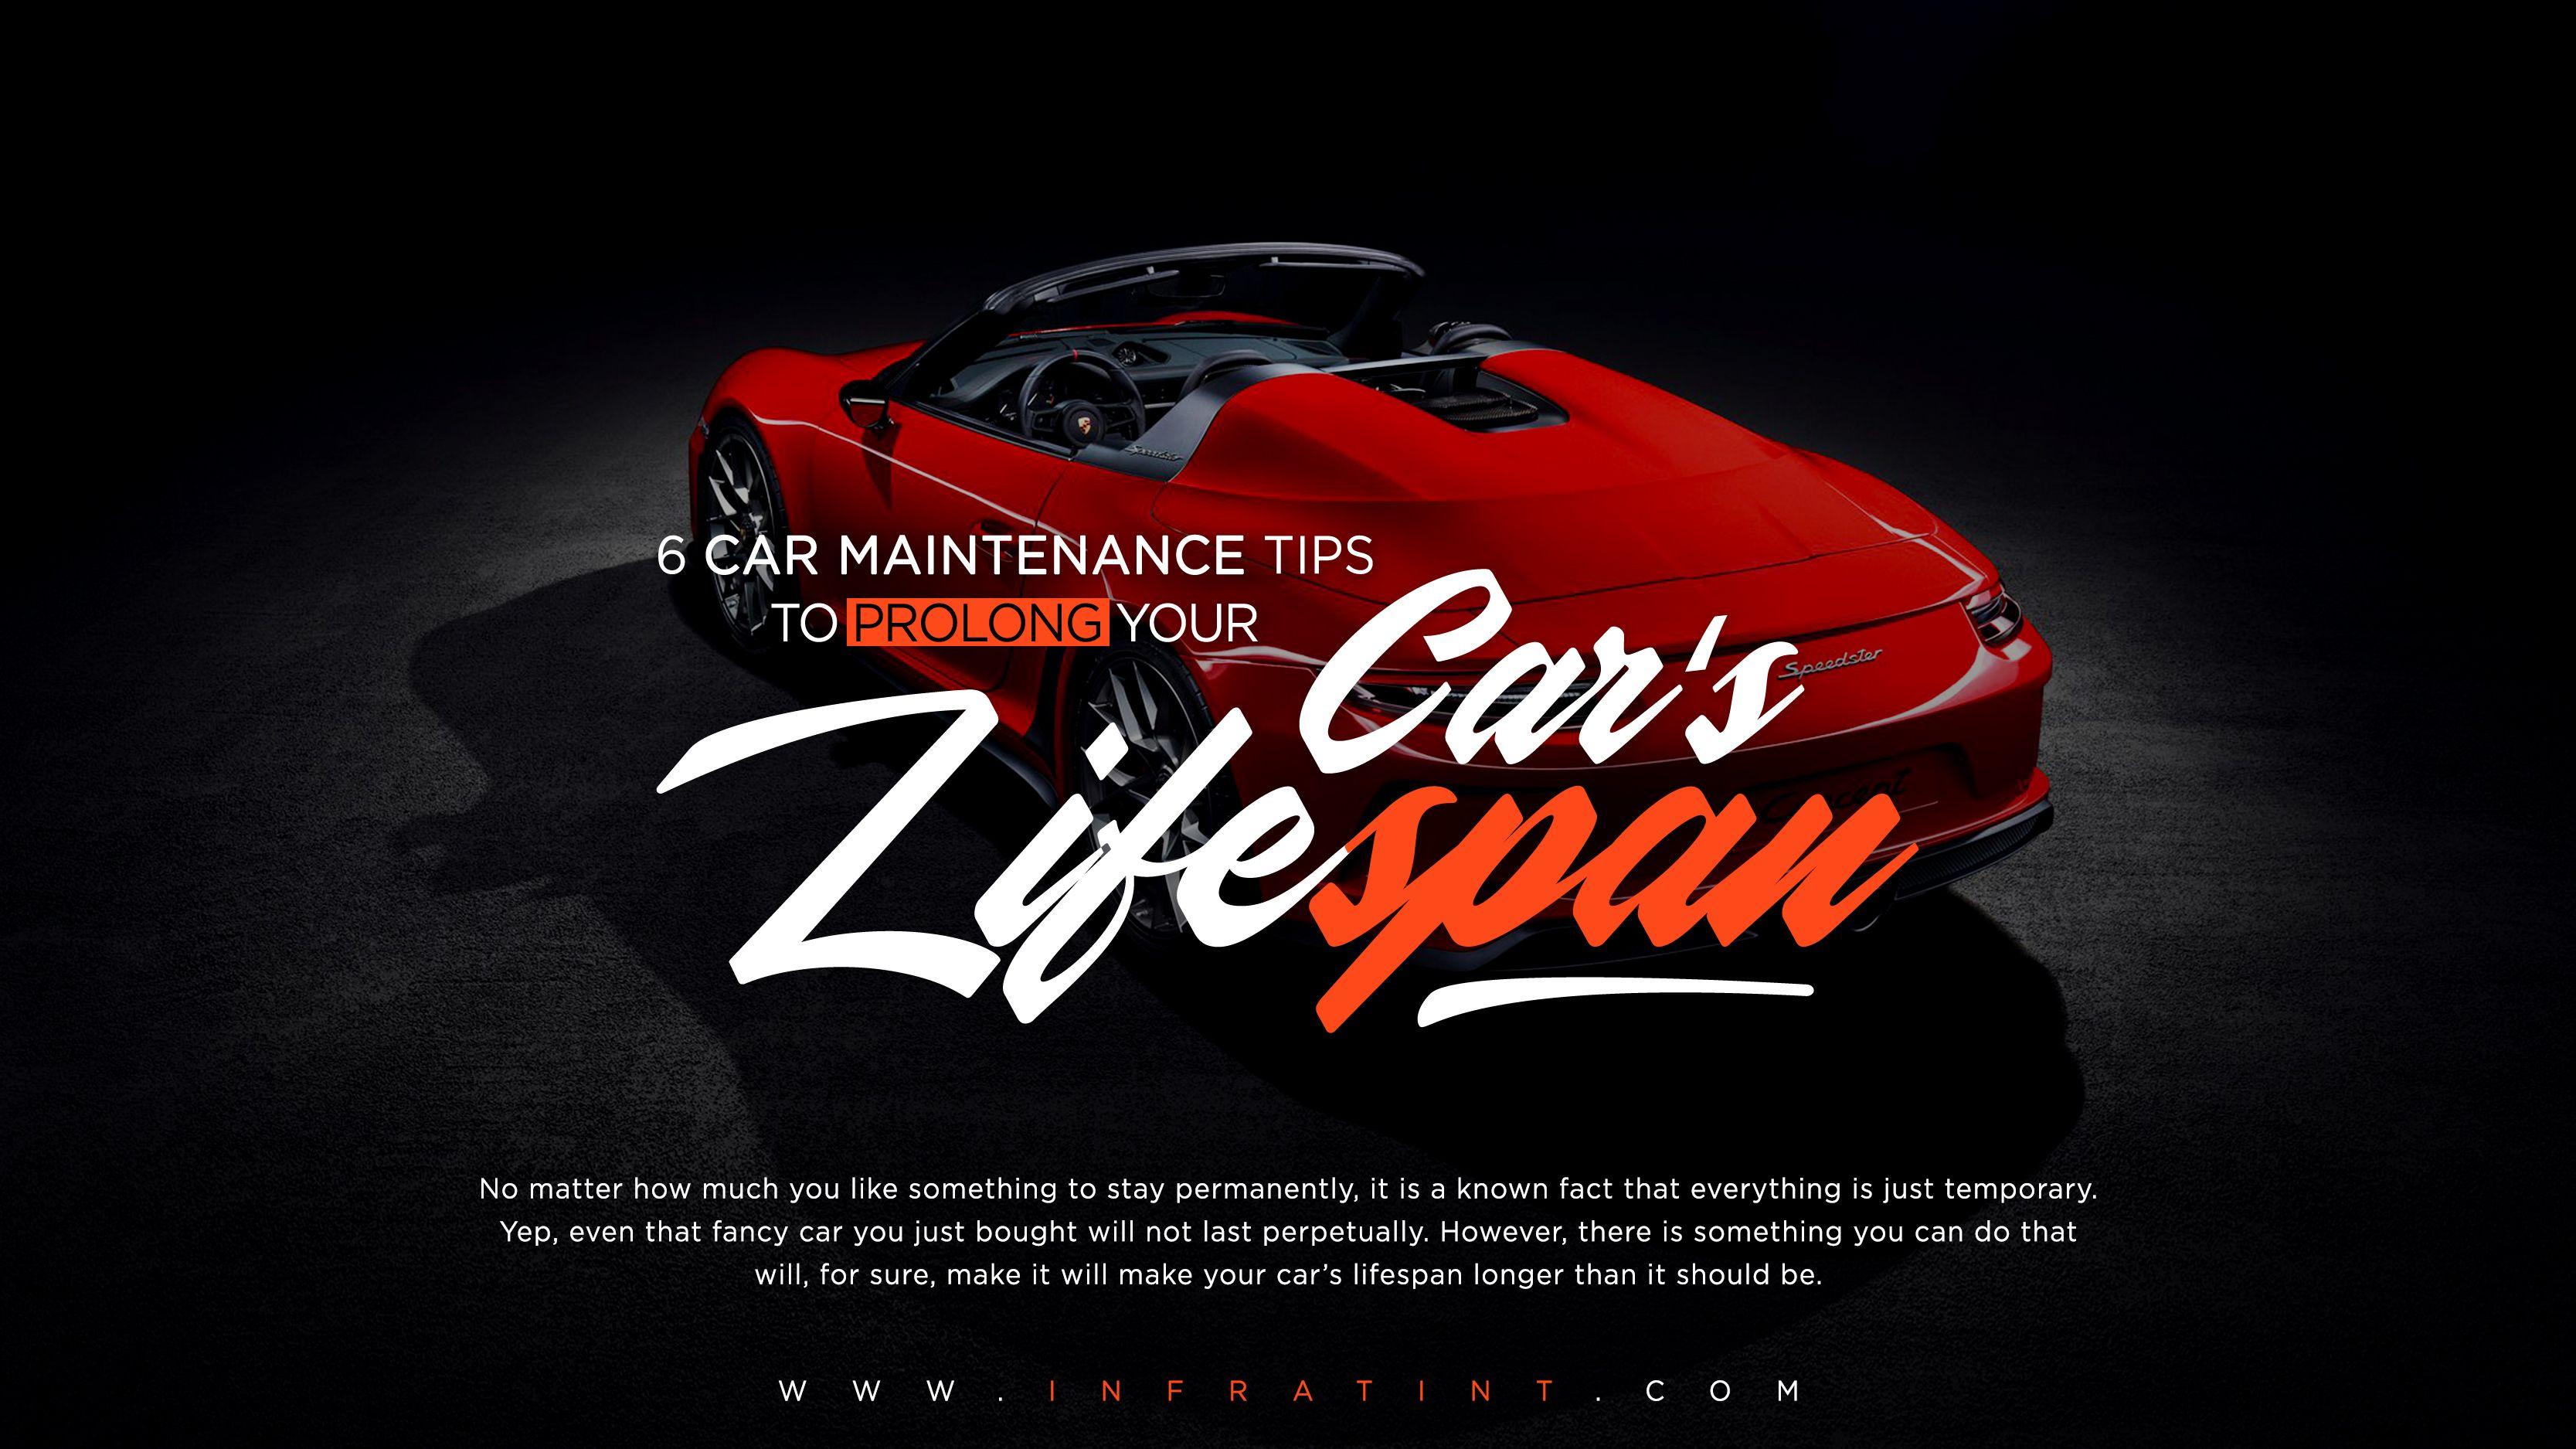 6 Car Maintenance Tips To Prolong Your Car S Lifespan Car Maintenance Fancy Cars Lifespan